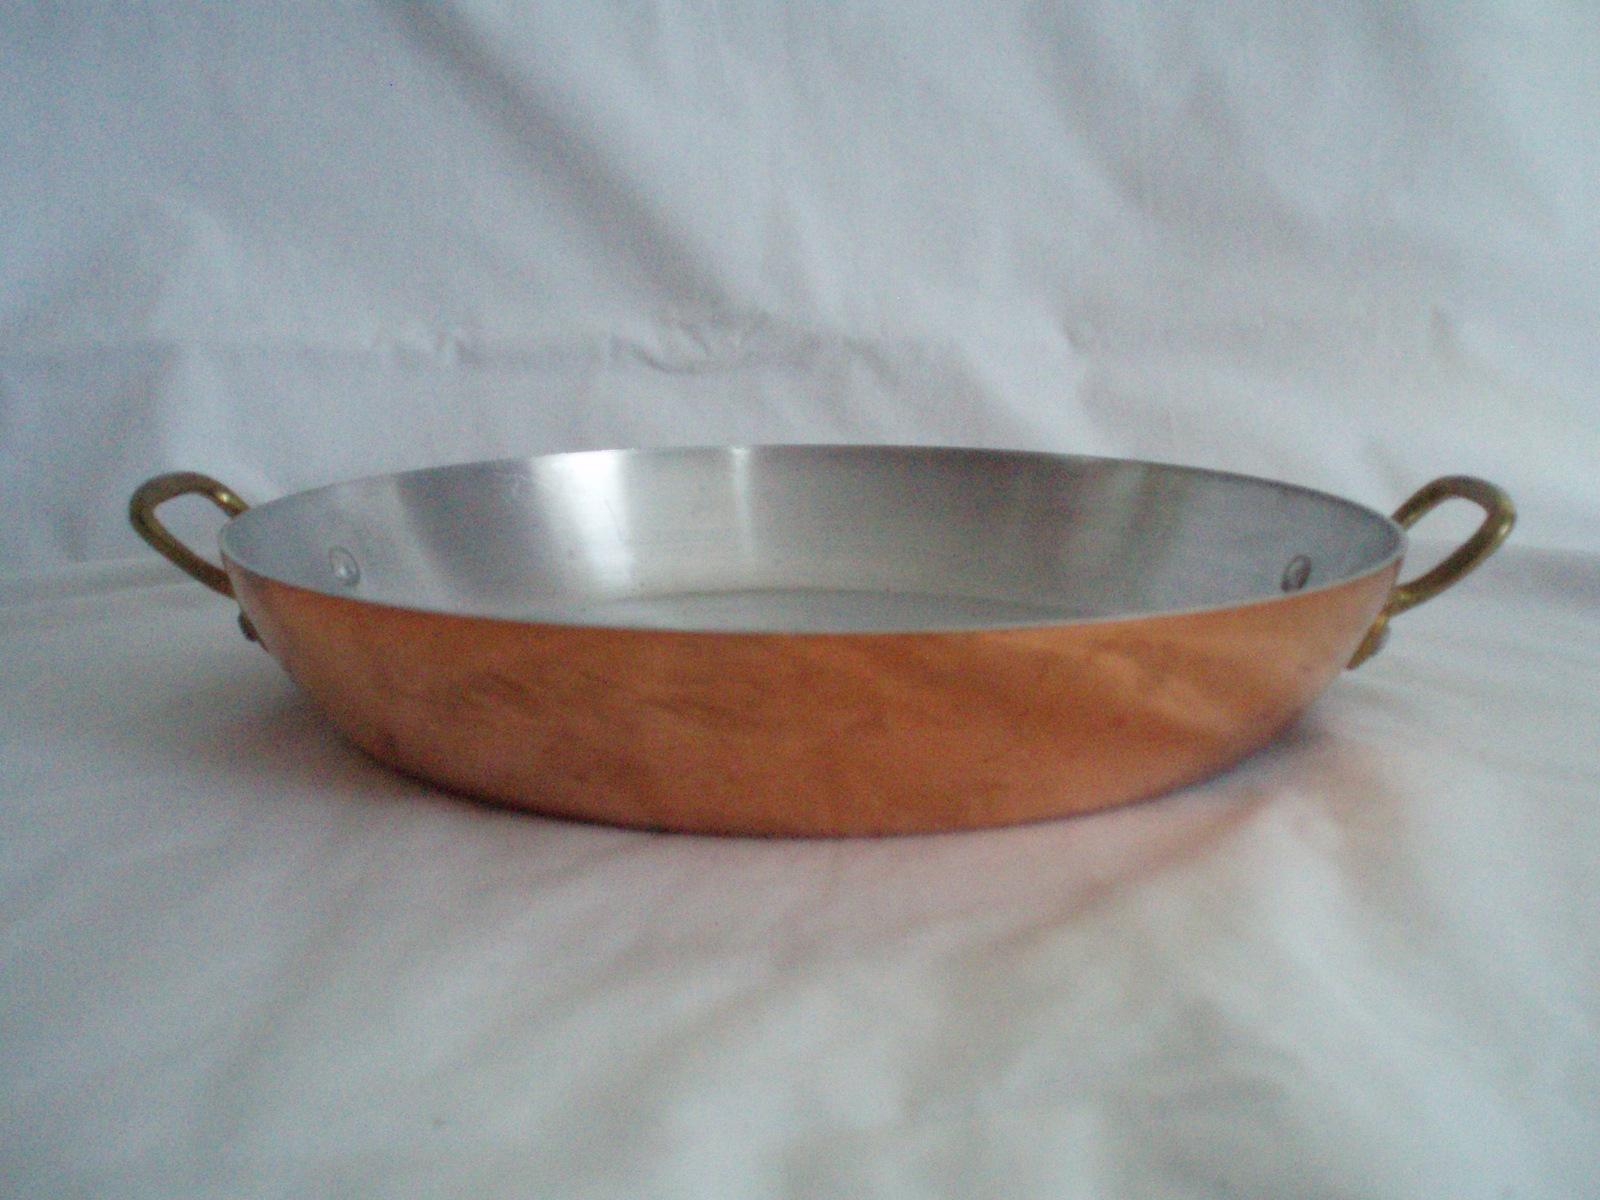 Copper Cookware Revere Ware  French Centura Baumen Vintage